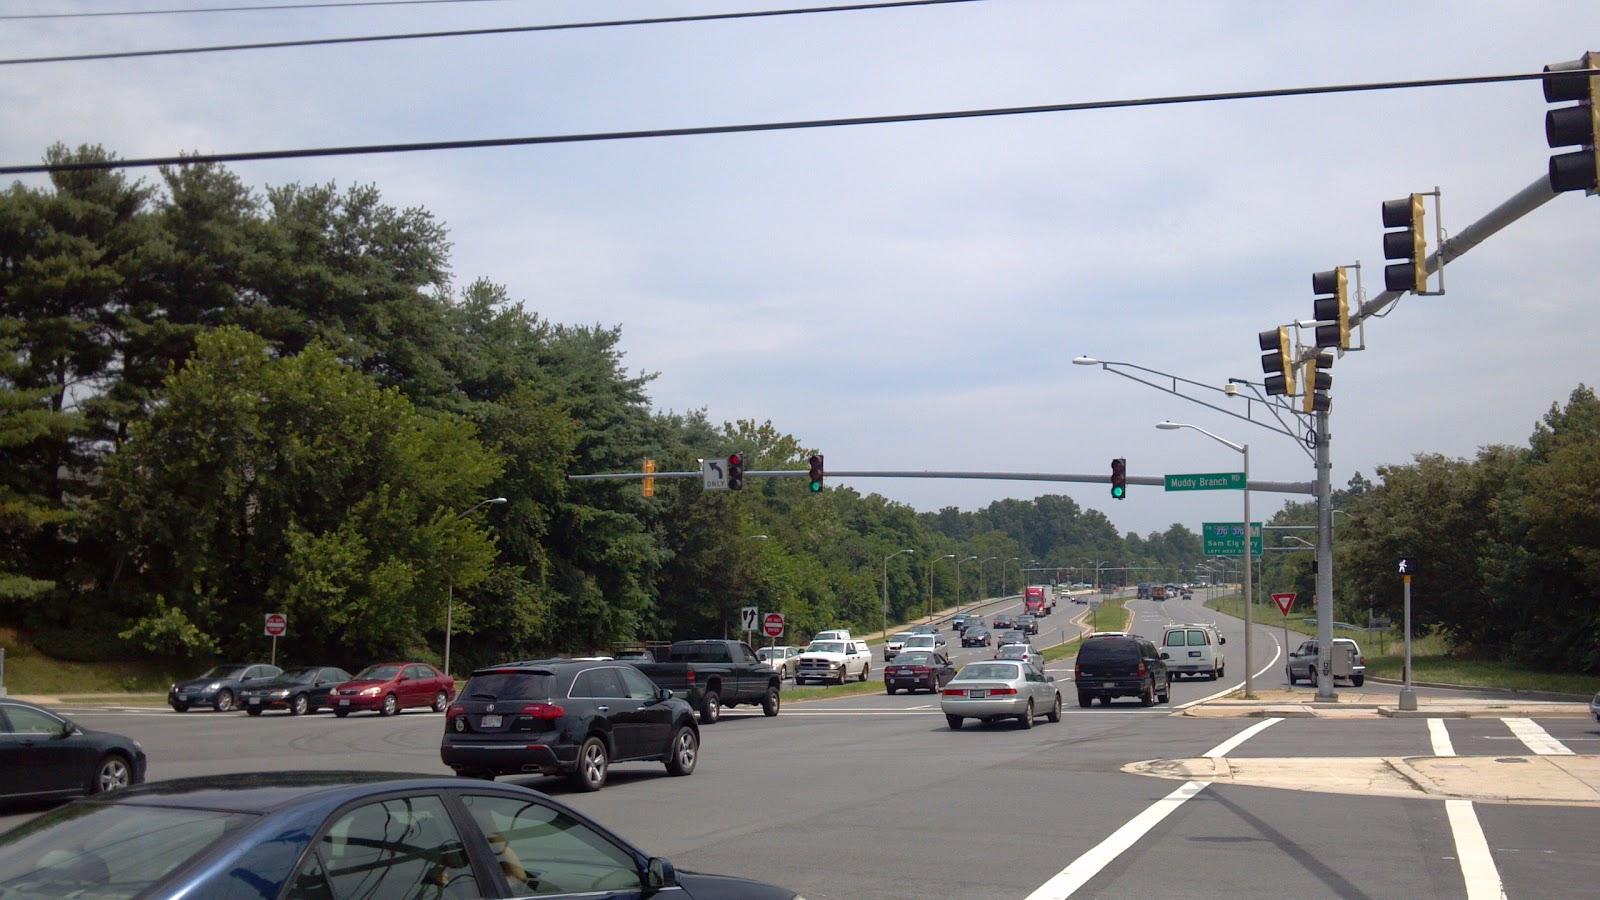 traffic lights intersection